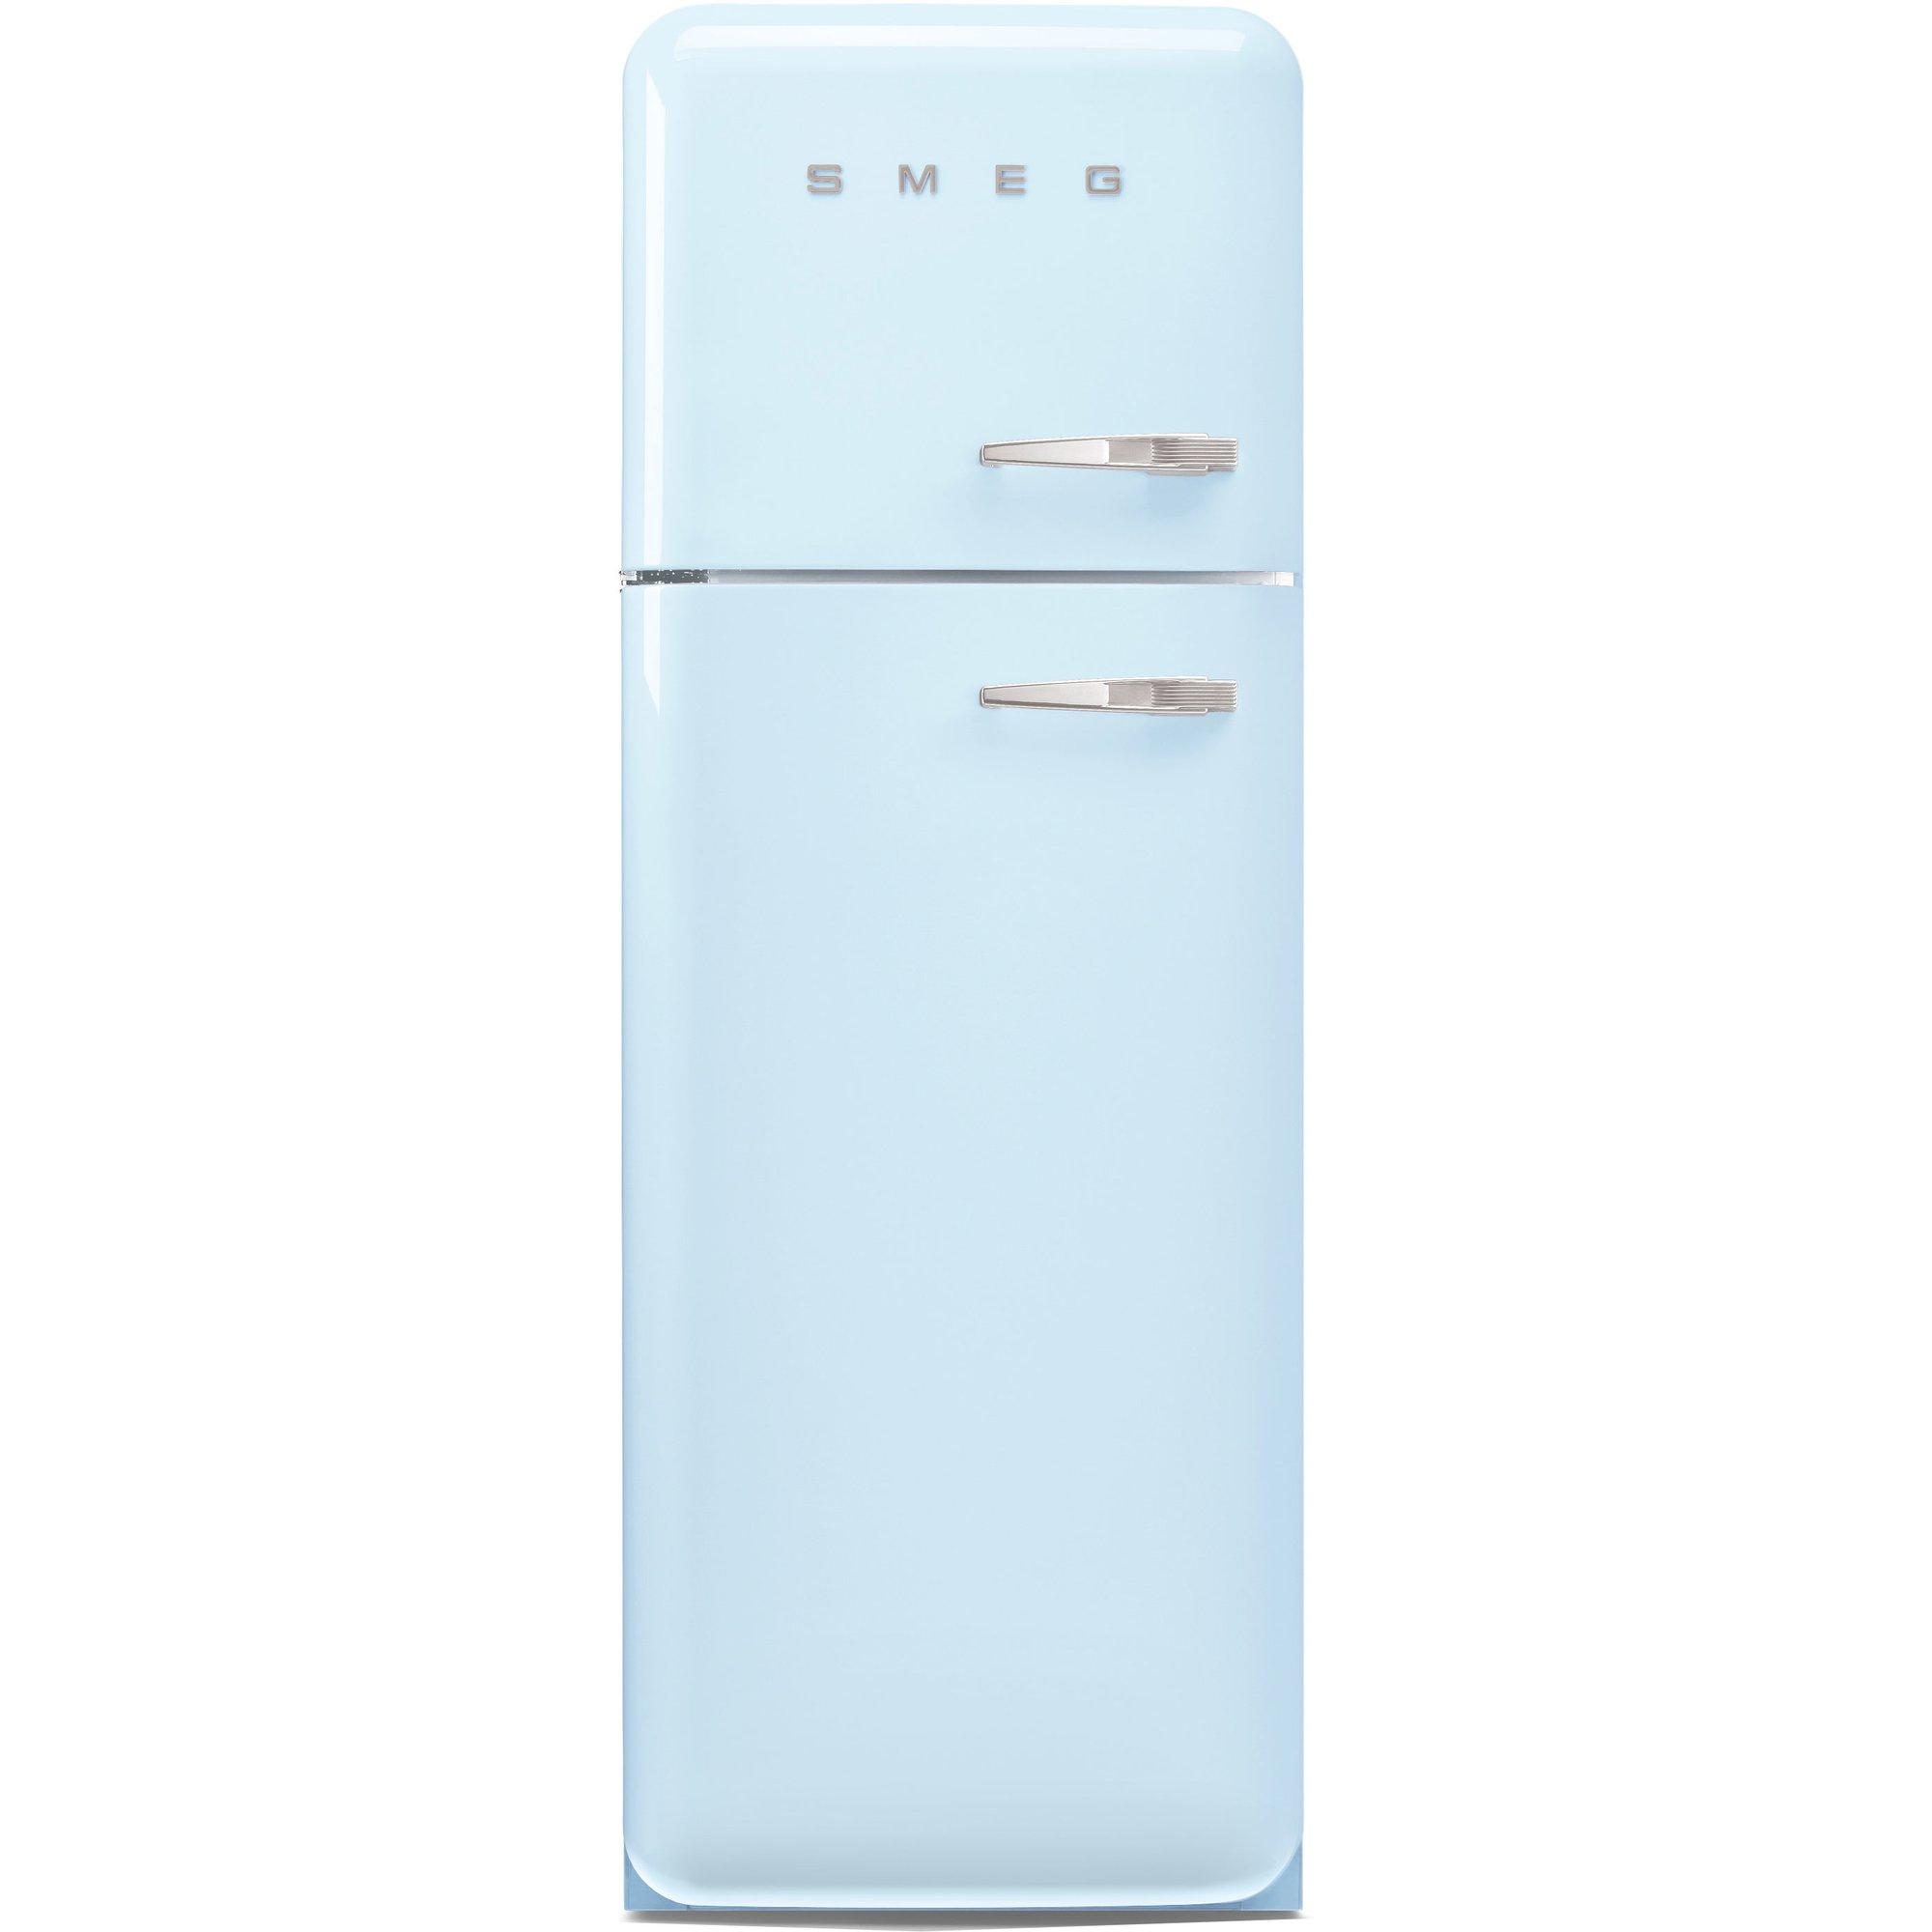 Smeg FAB30LPB5 Køle-/fryseskab pastelblå